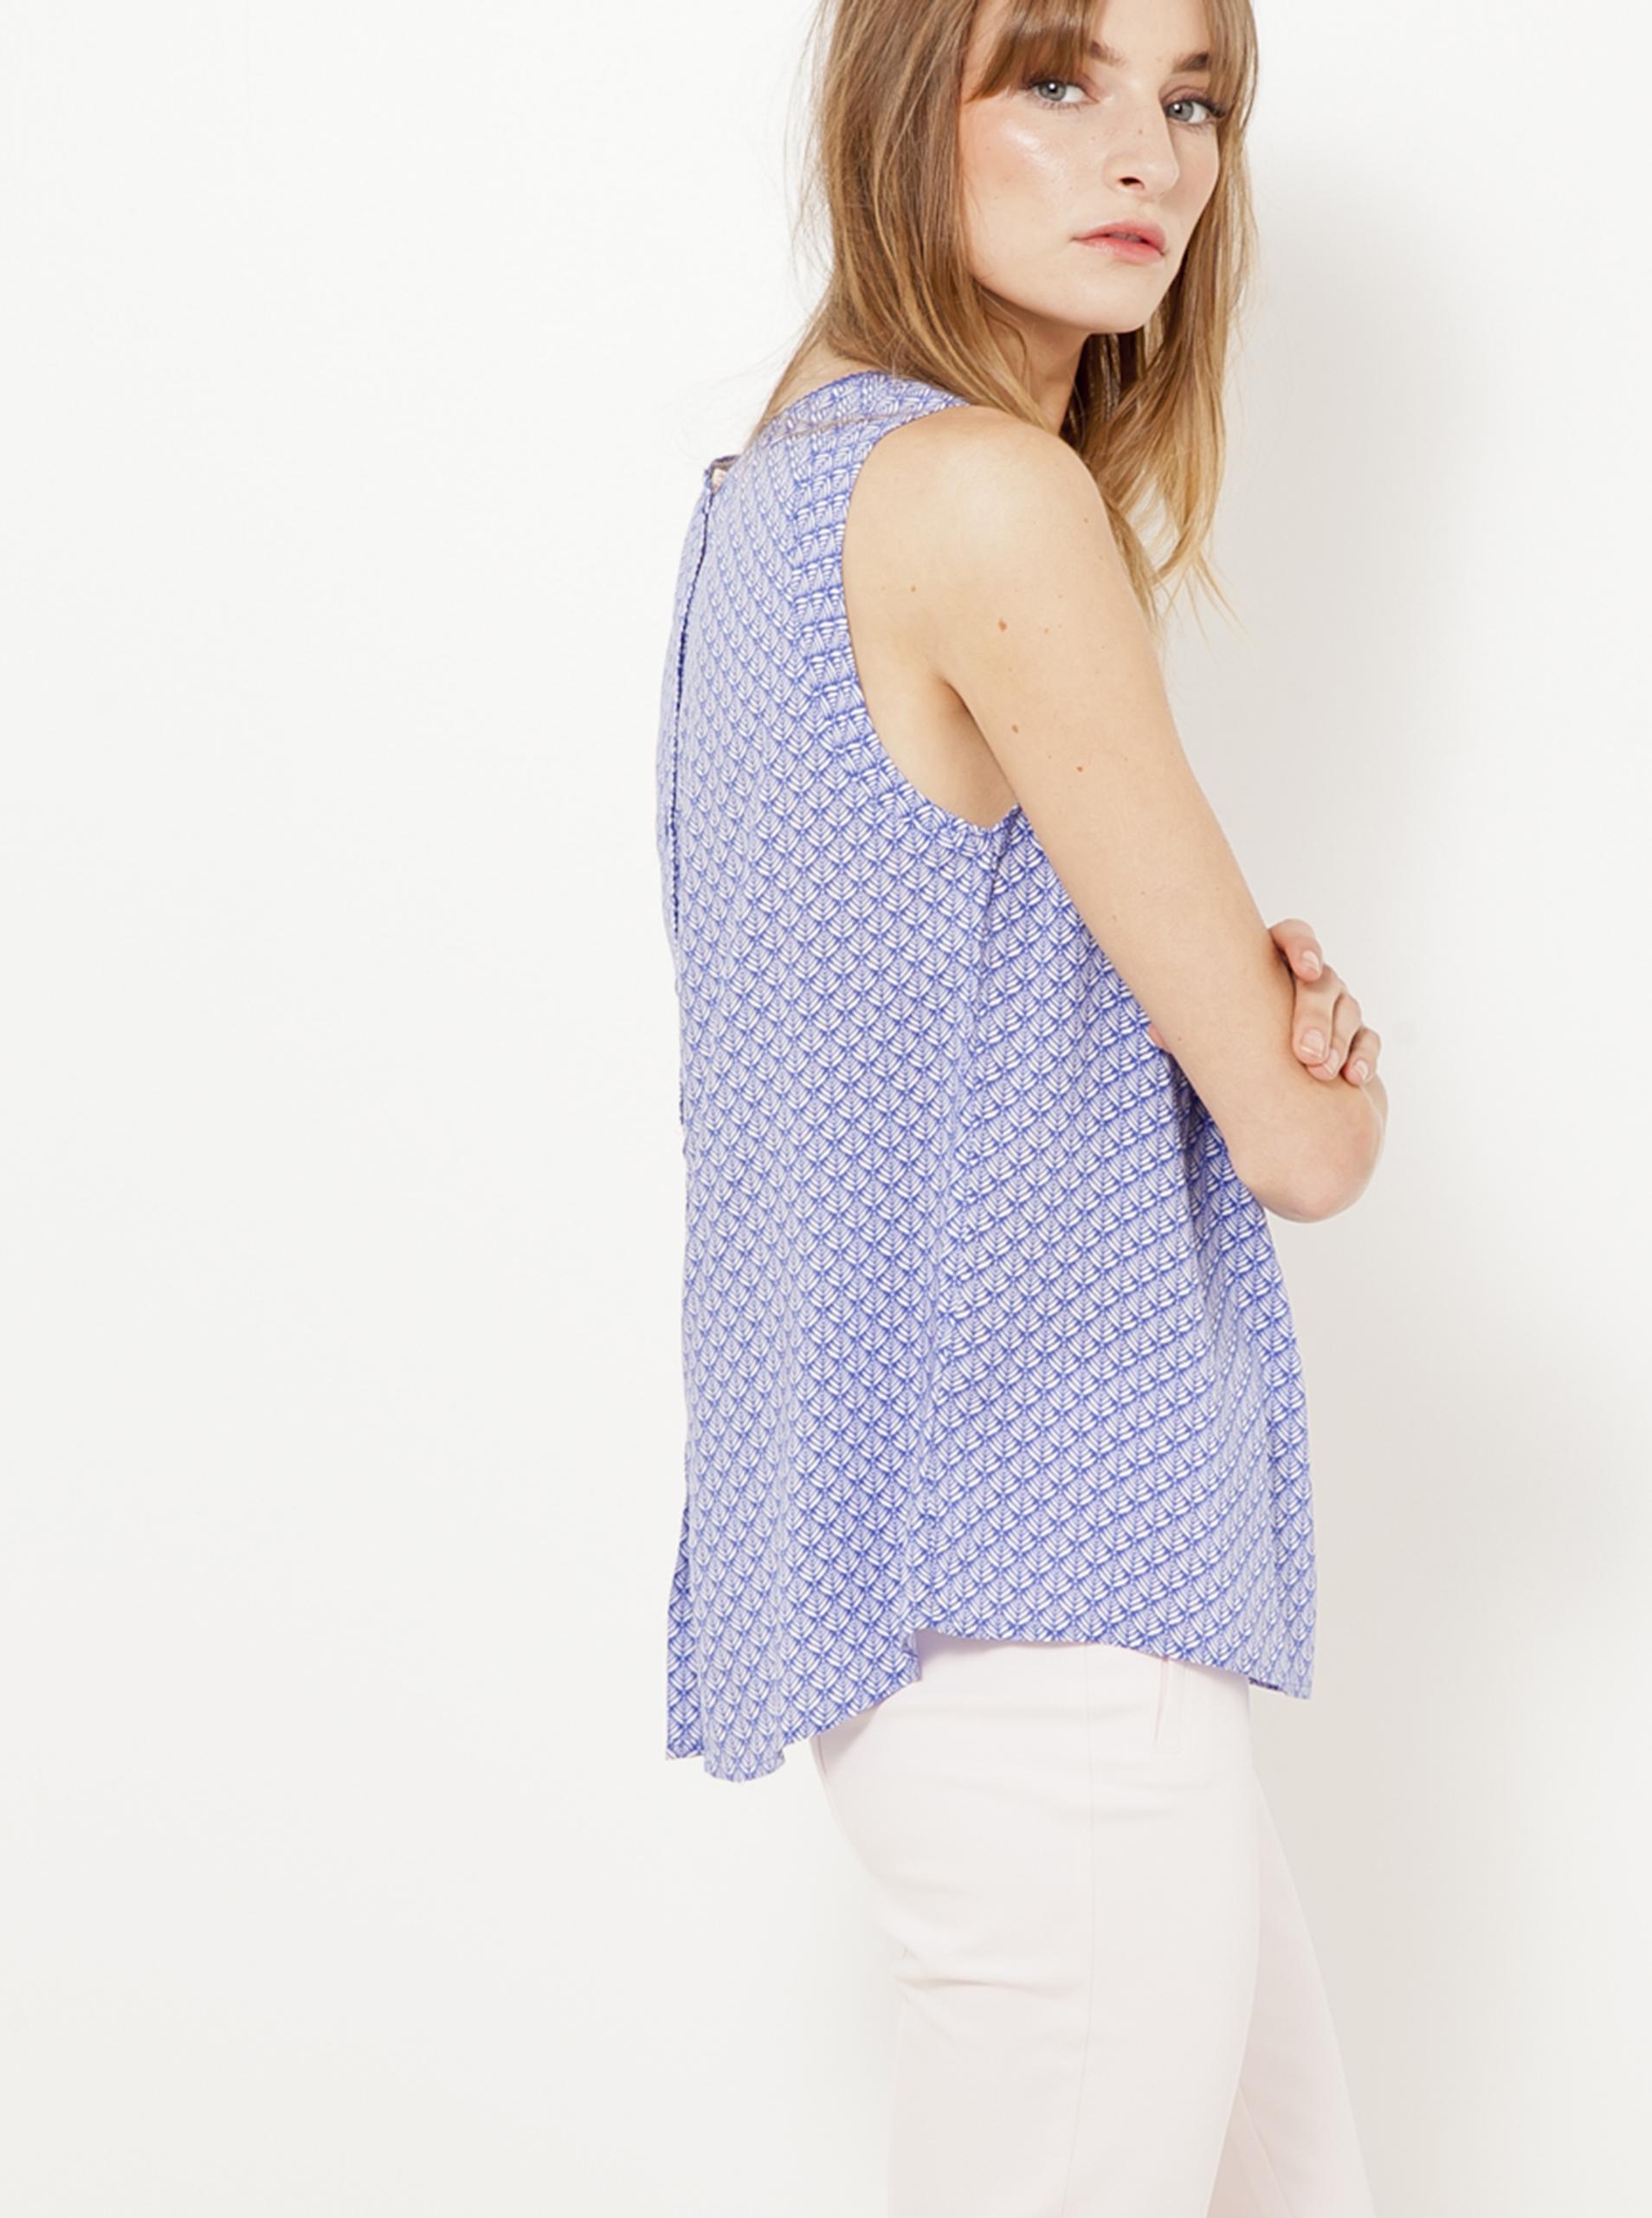 CAMAIEU Women's blouse blue